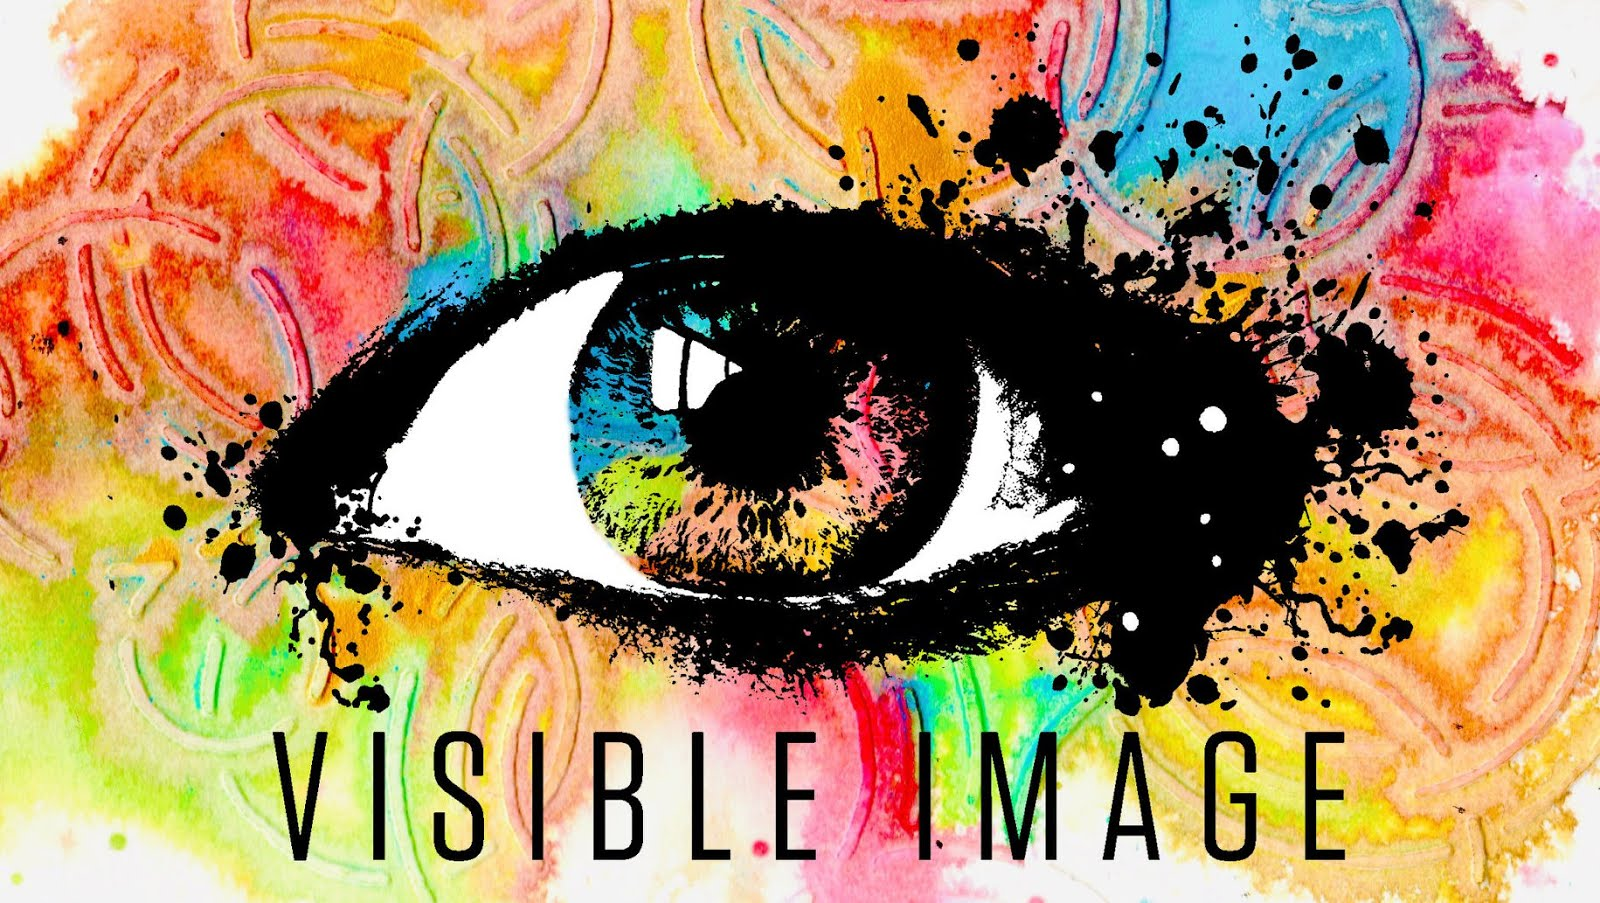 Visible Image DT Member